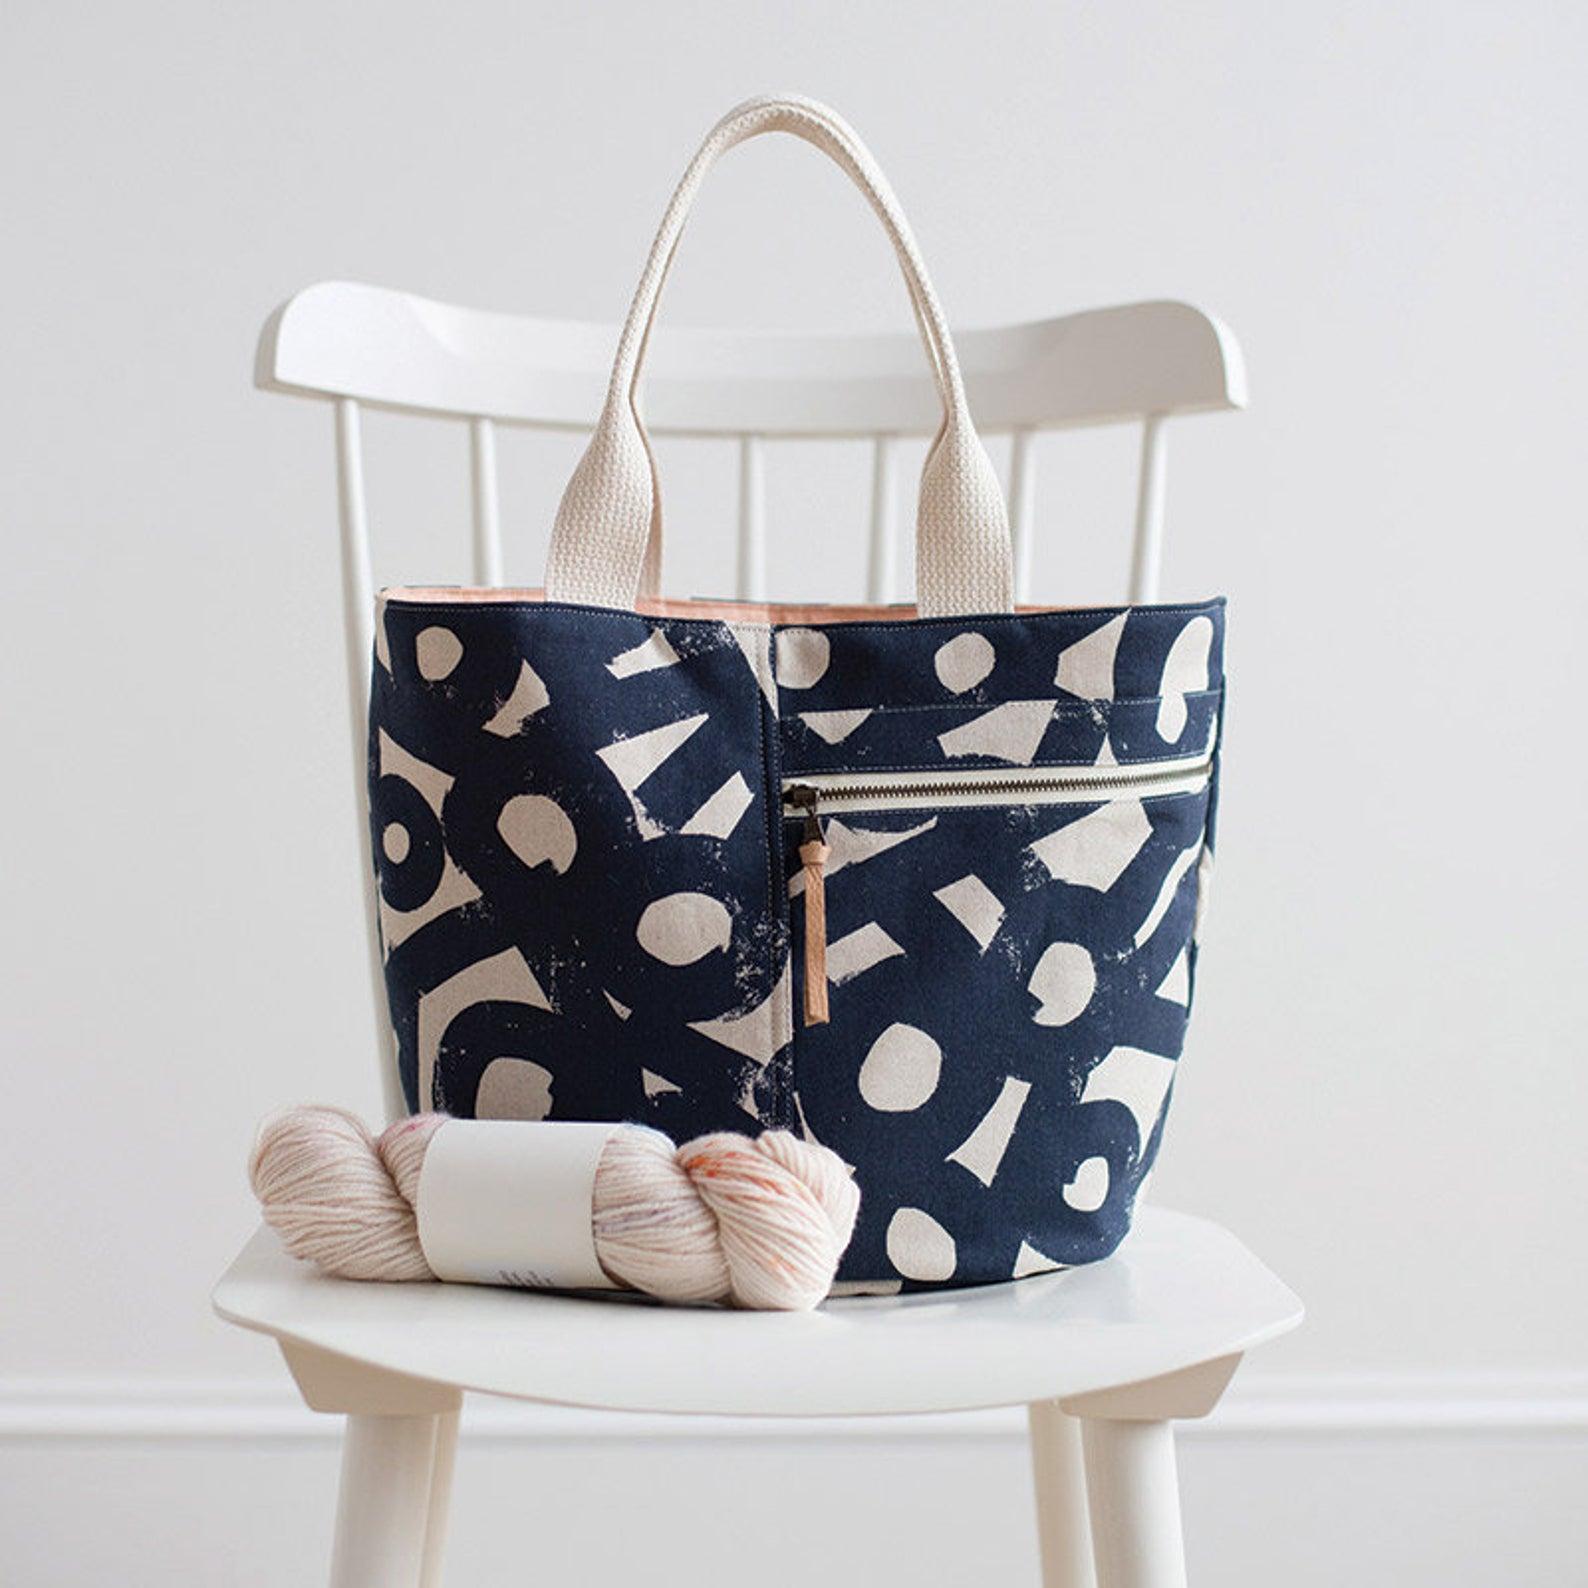 cotton tote sewing kit